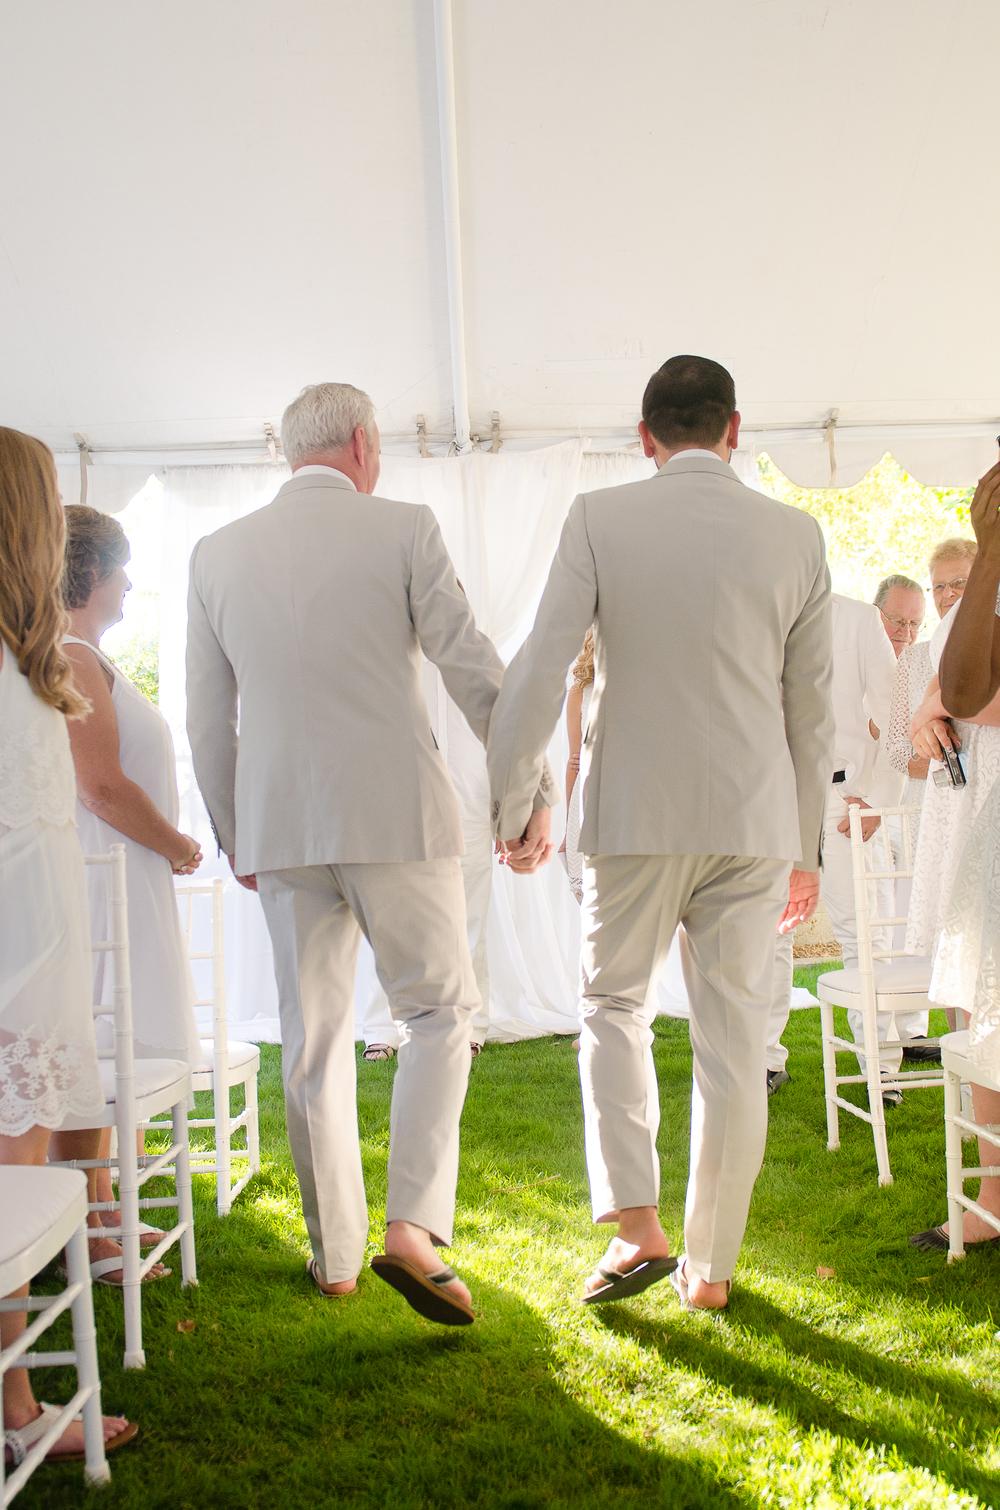 Wedding_Robert_and_Talal_by_BradfordJones.com-227.jpg